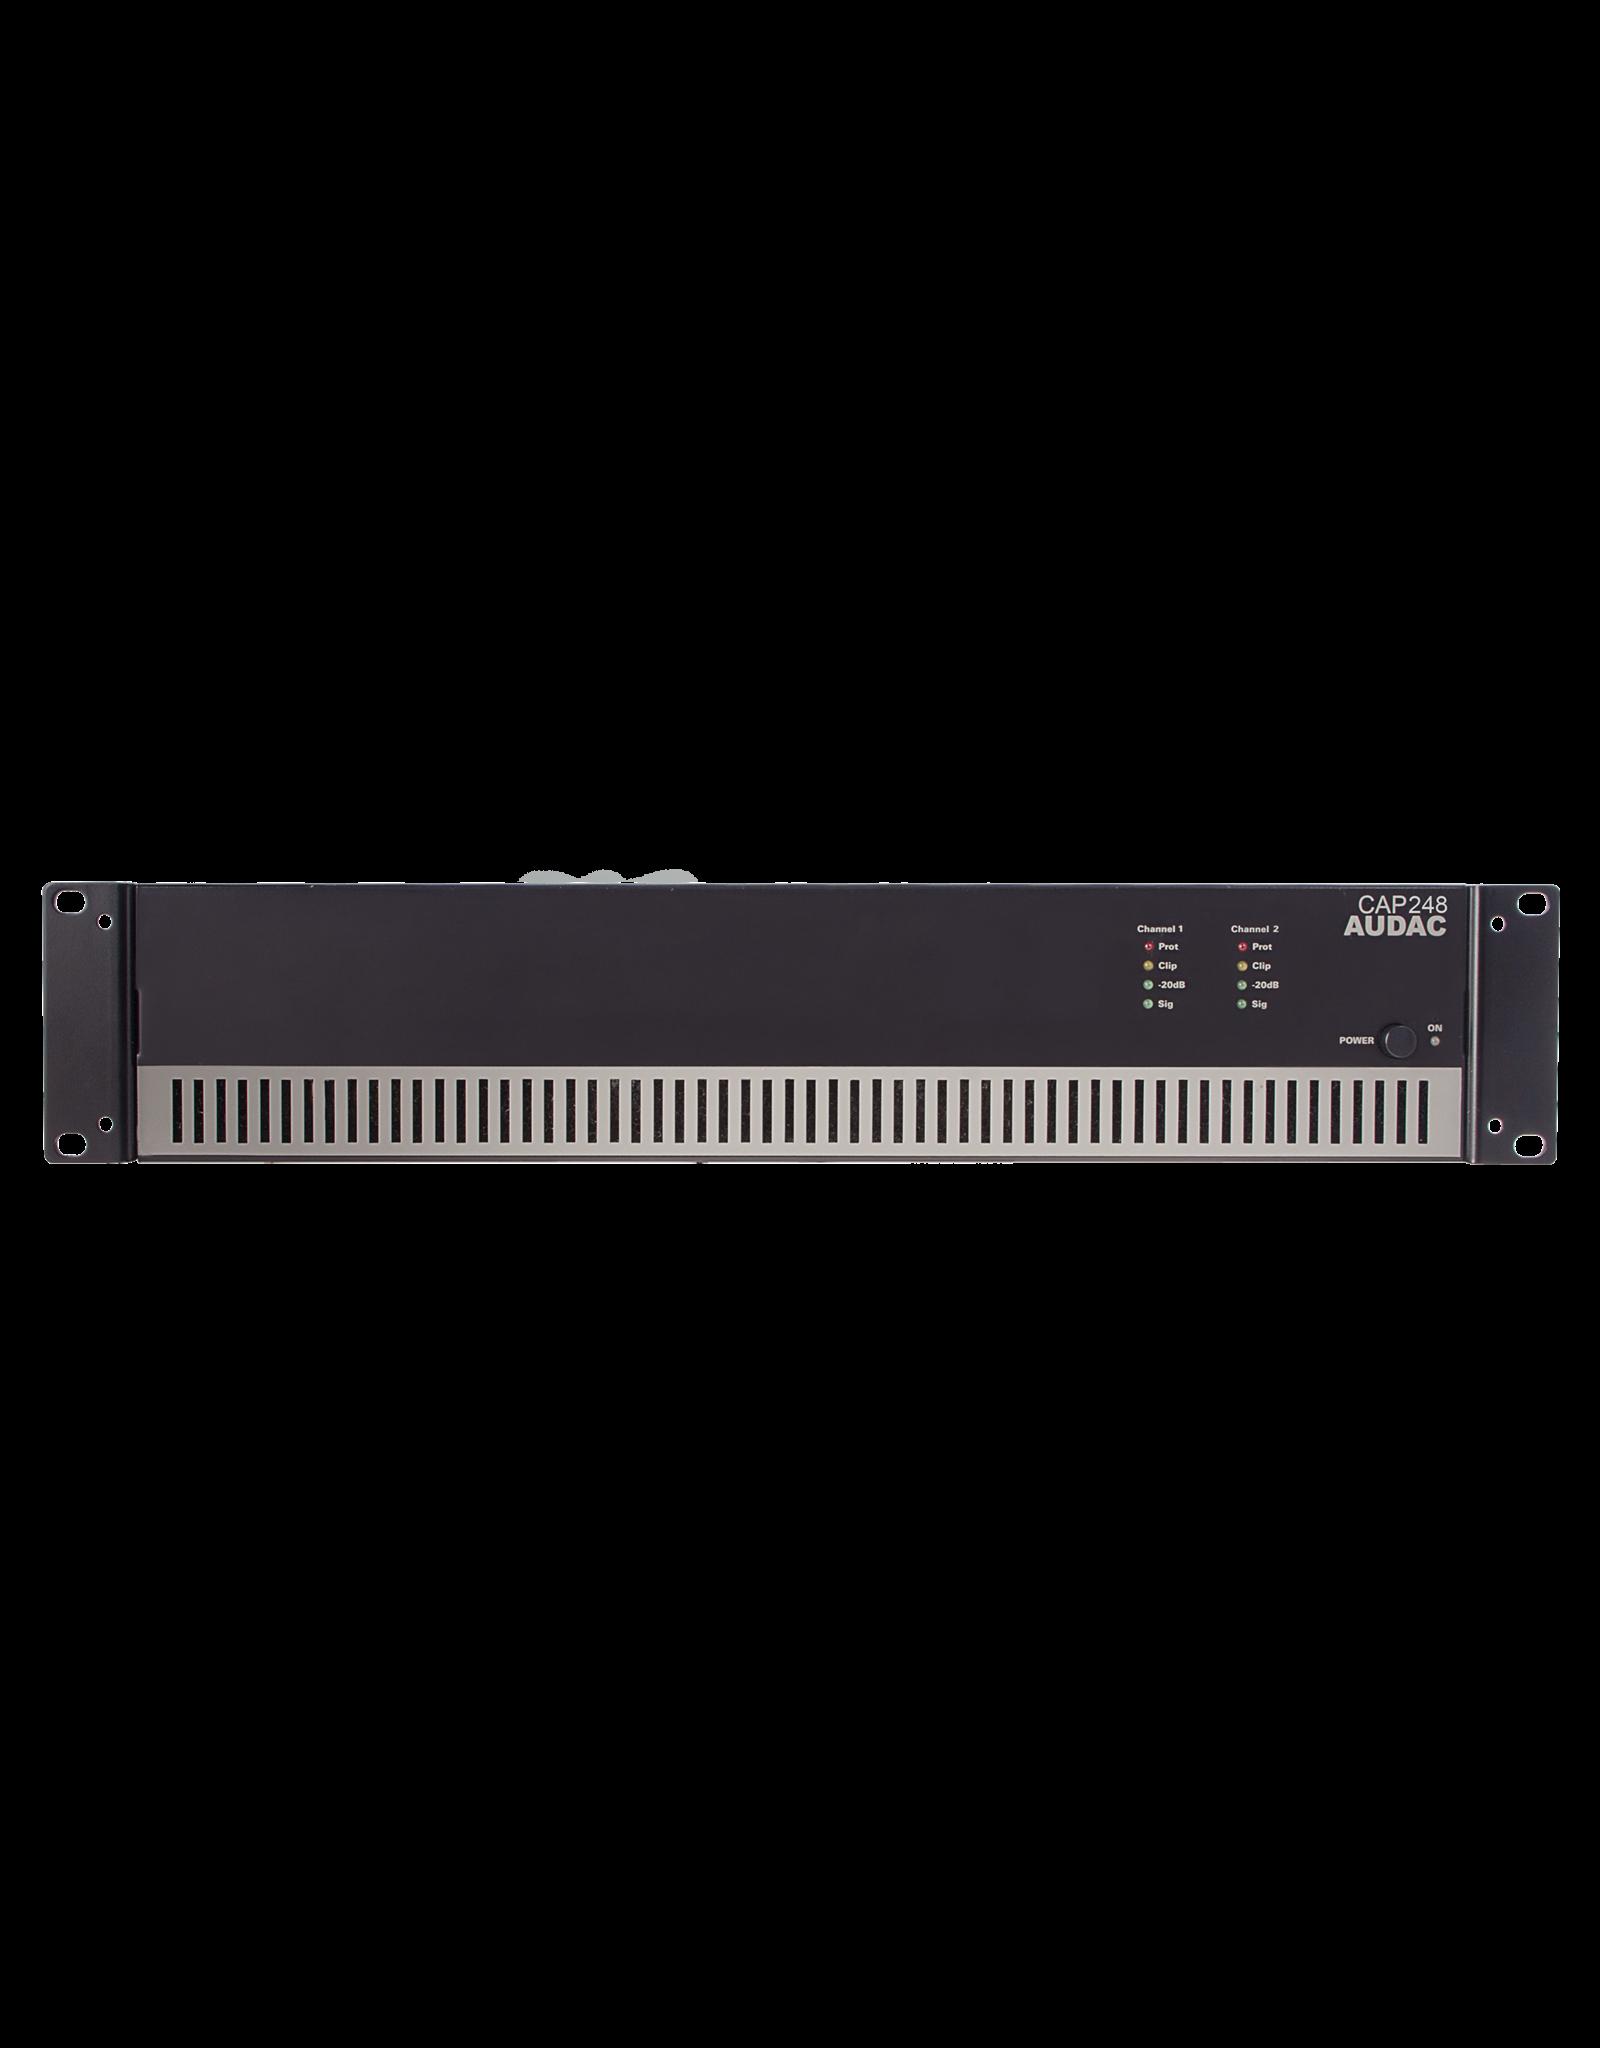 Audac Dual-channel power amplifier 2 x 480W 100V